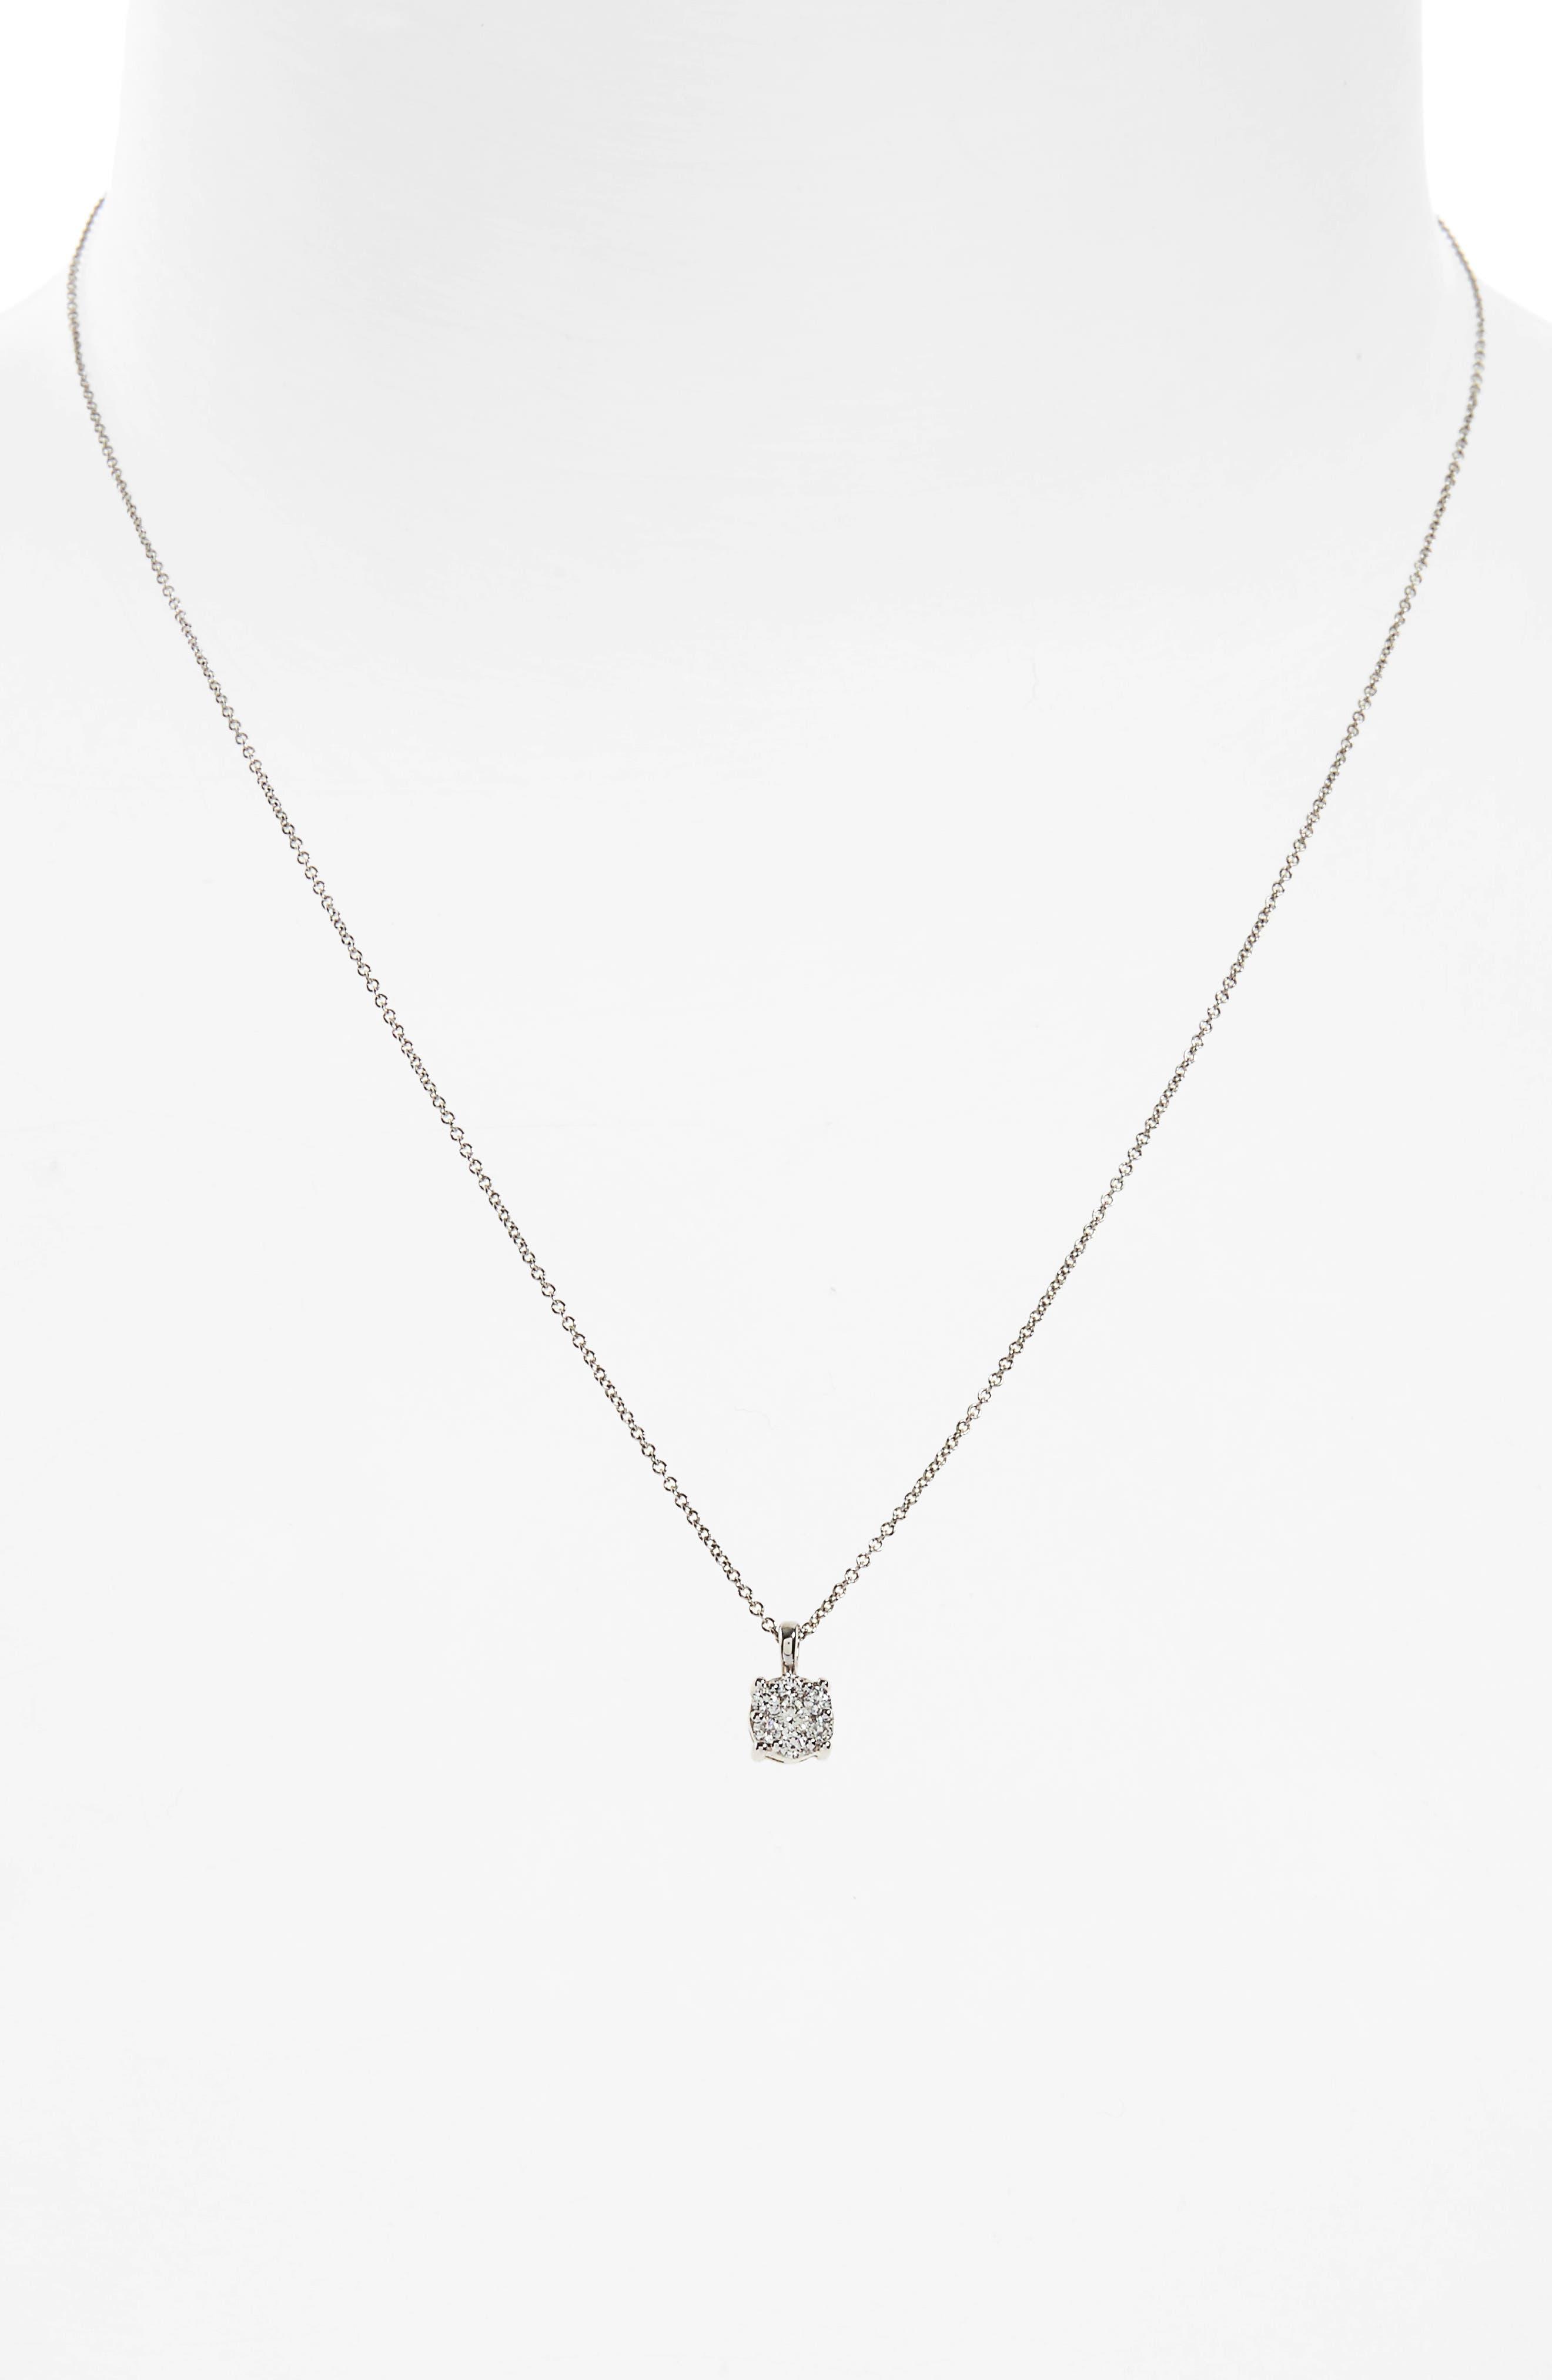 Lucky 7 Diamond Pendant Necklace,                             Alternate thumbnail 3, color,                             711